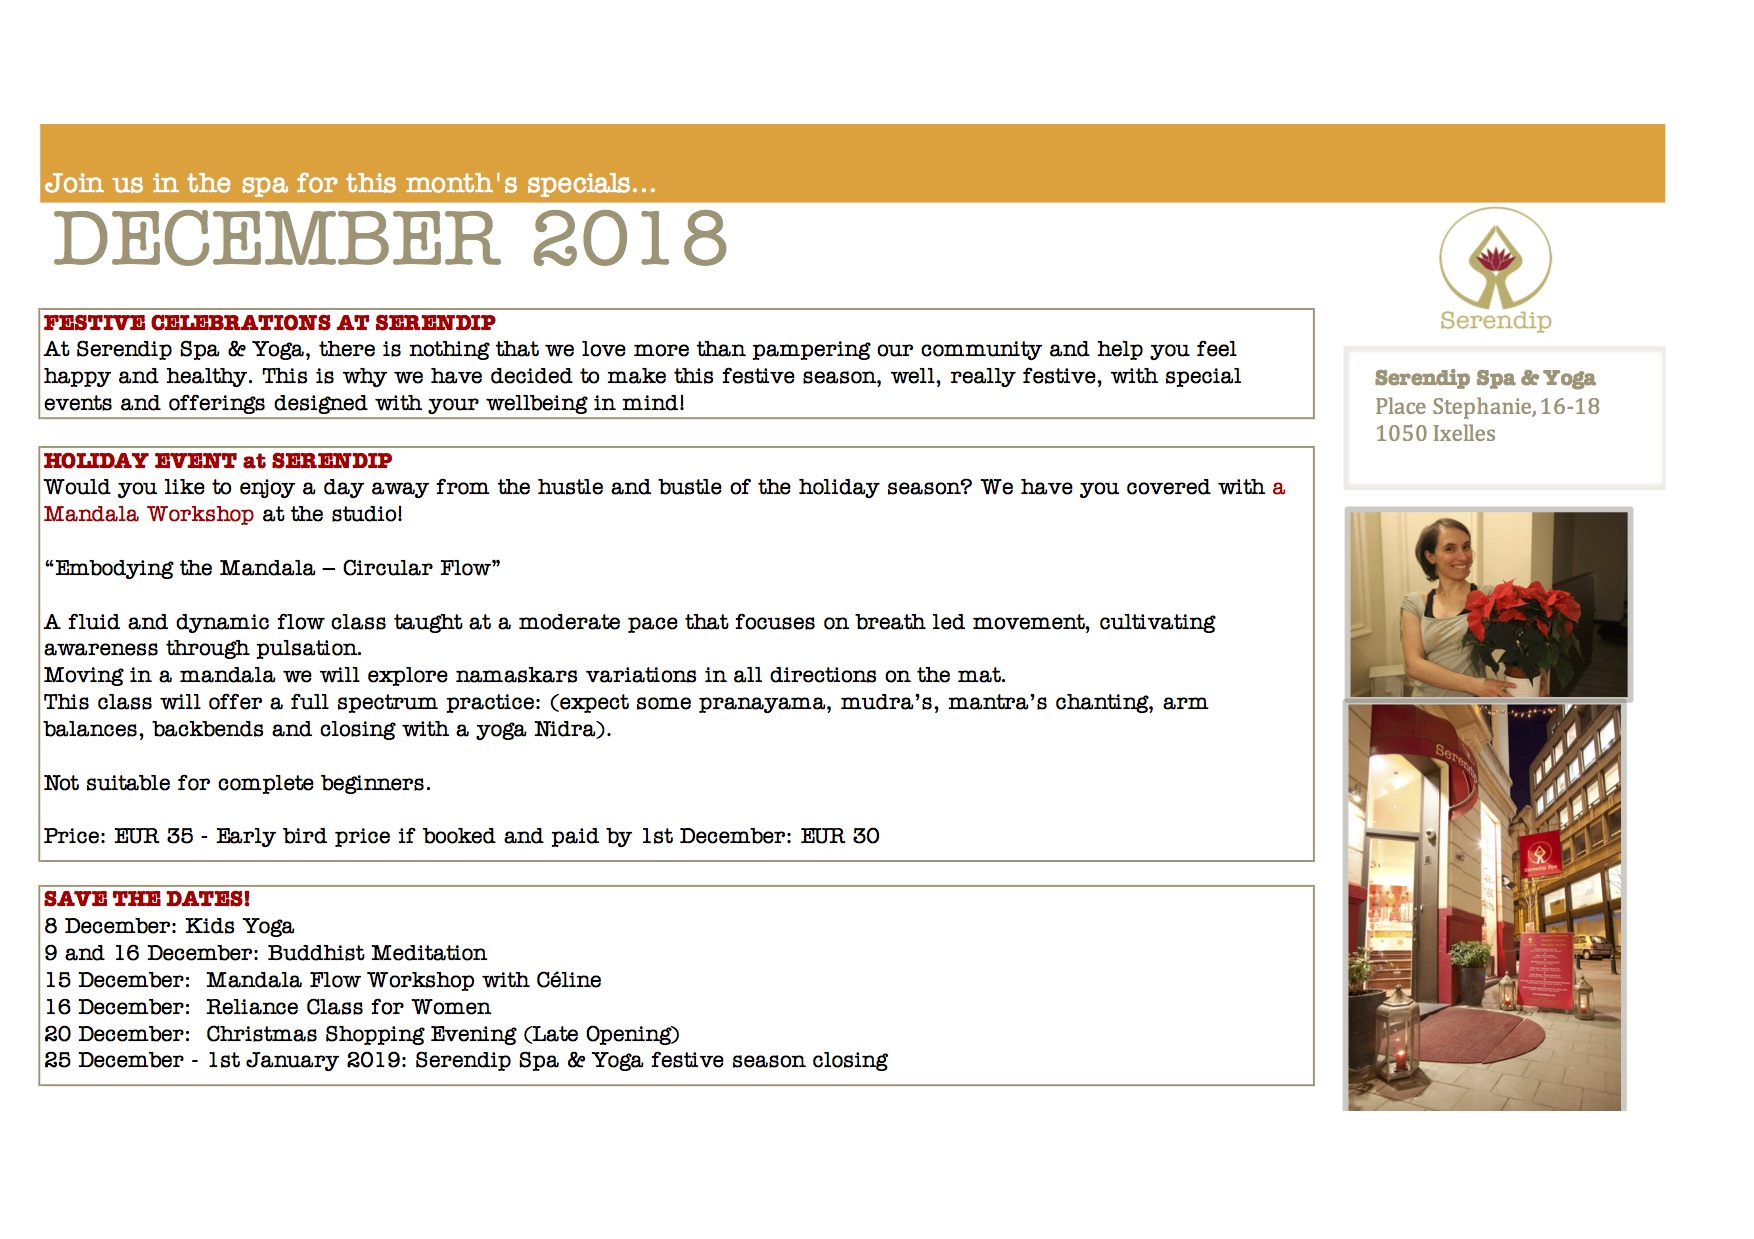 serendip spa and yoga calendar 2018_December A4 BACK.jpg